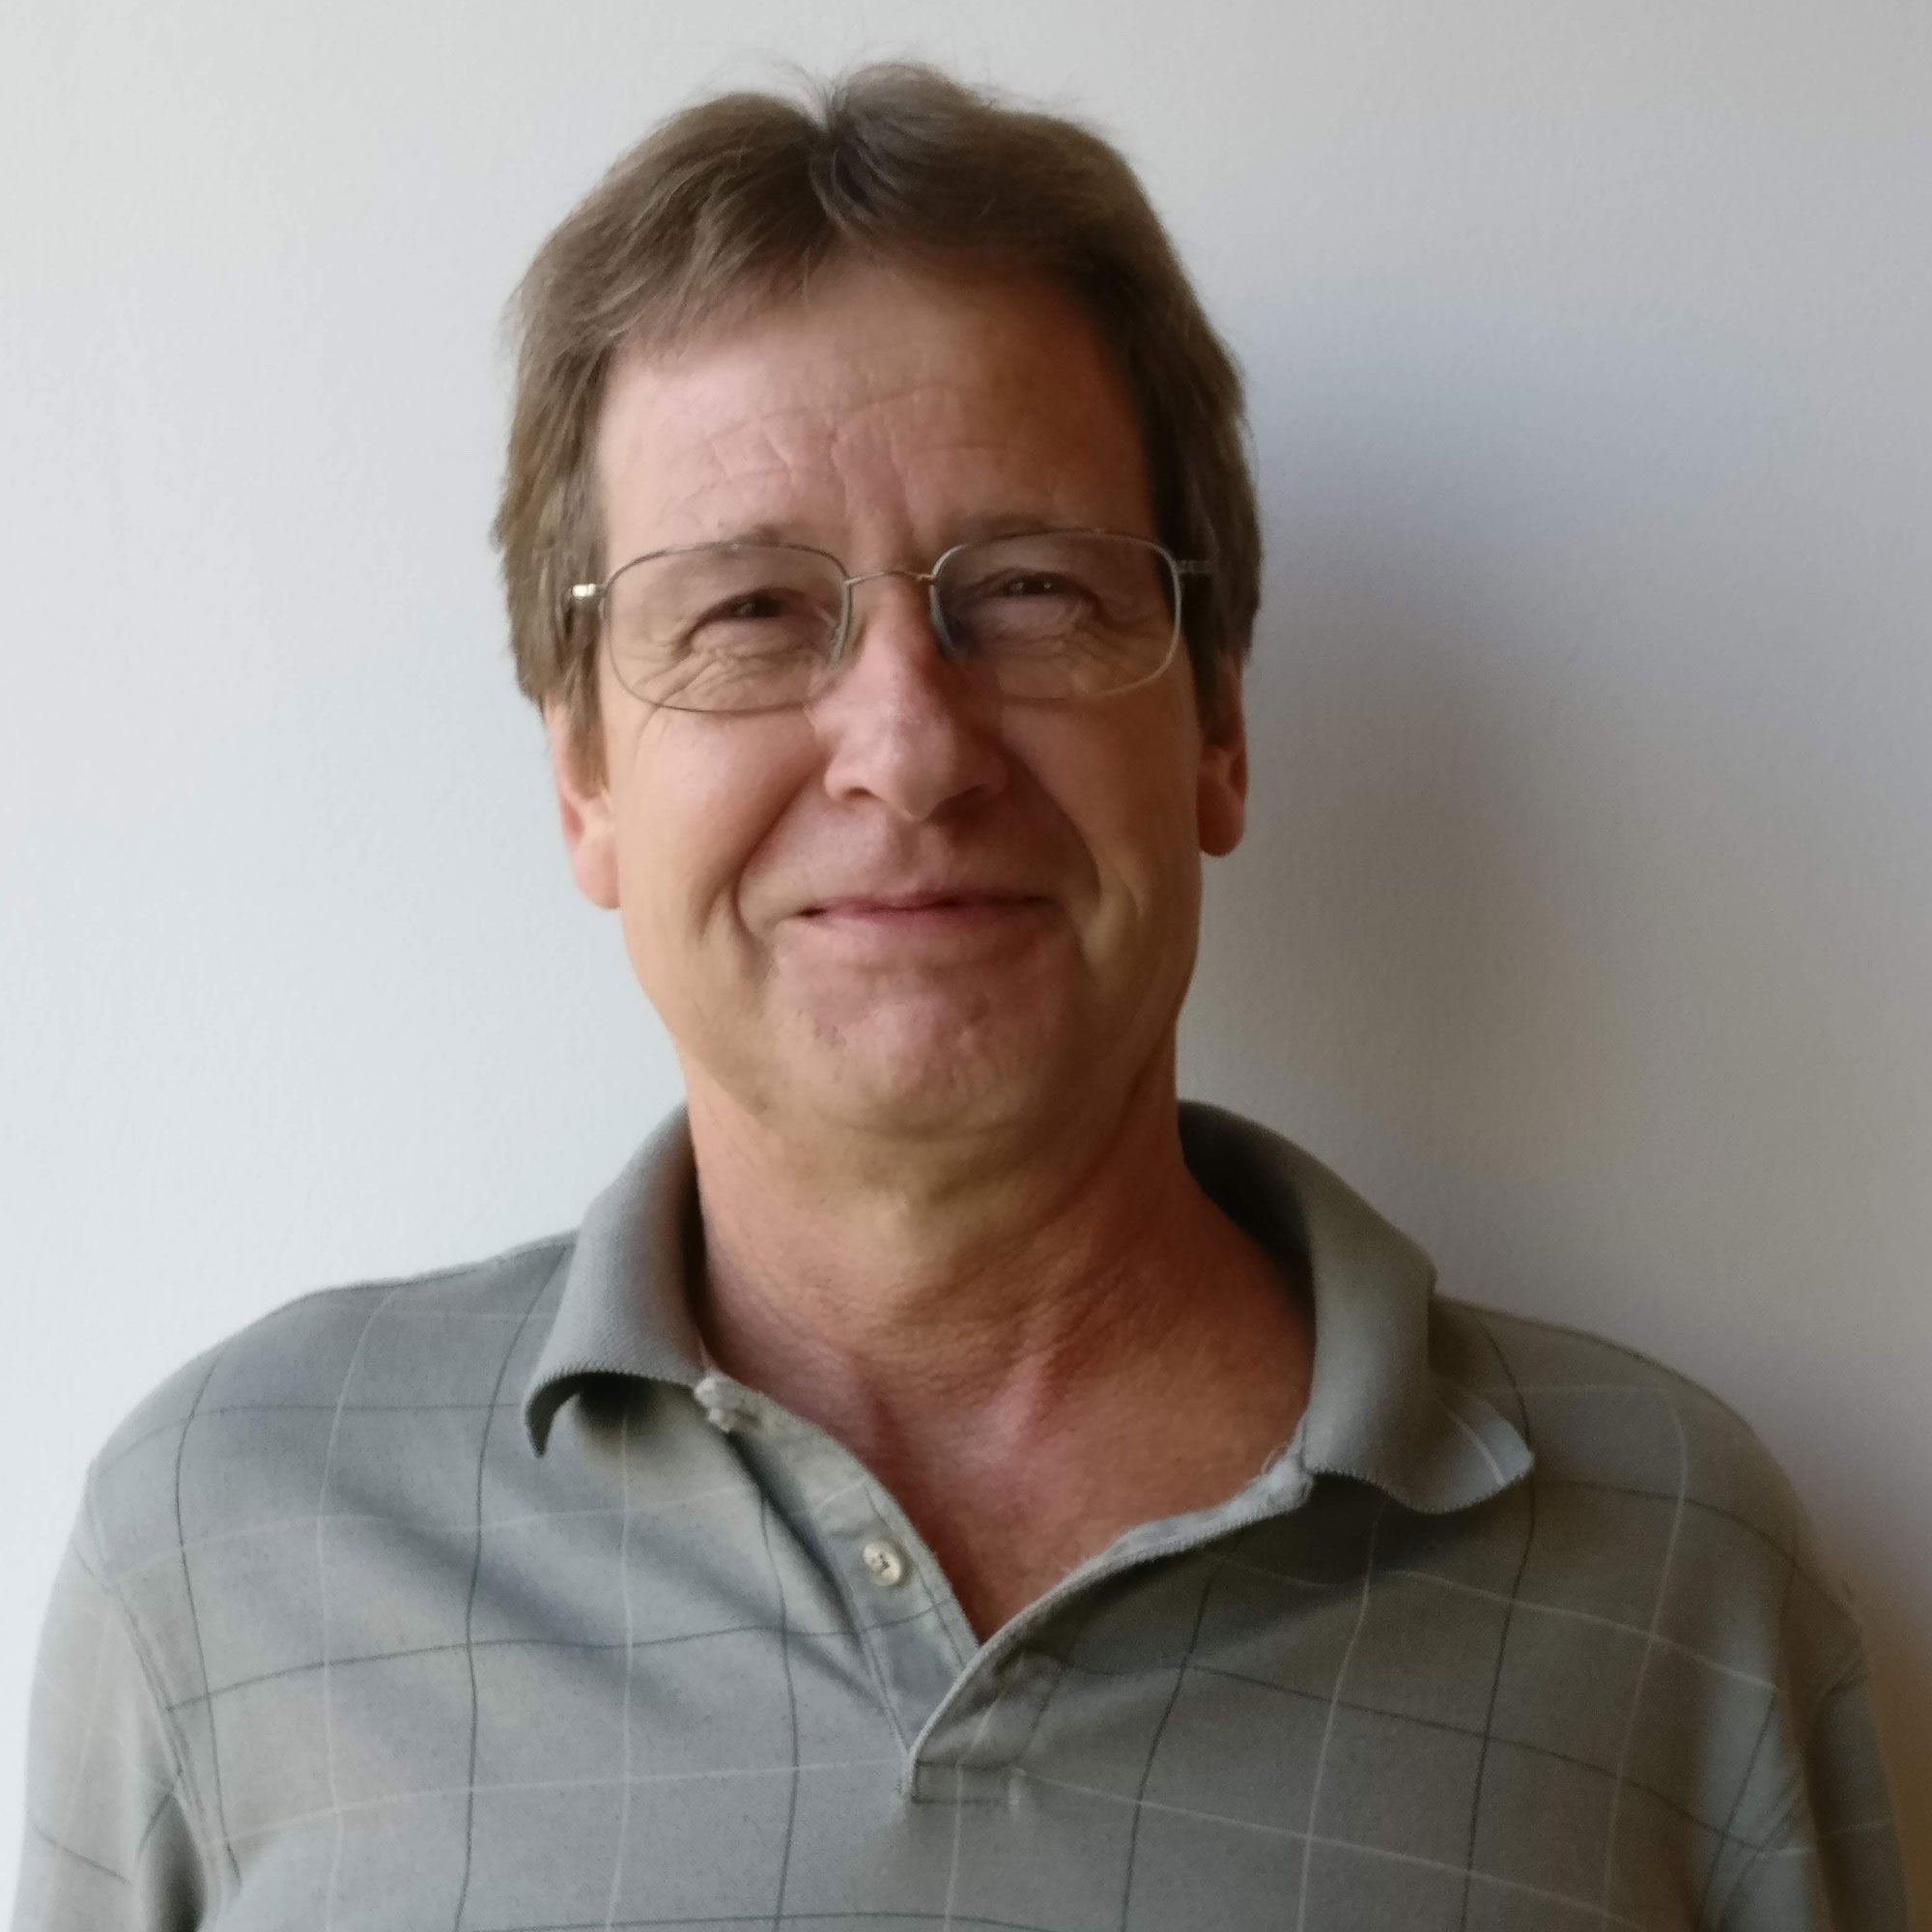 Rick Shepherd